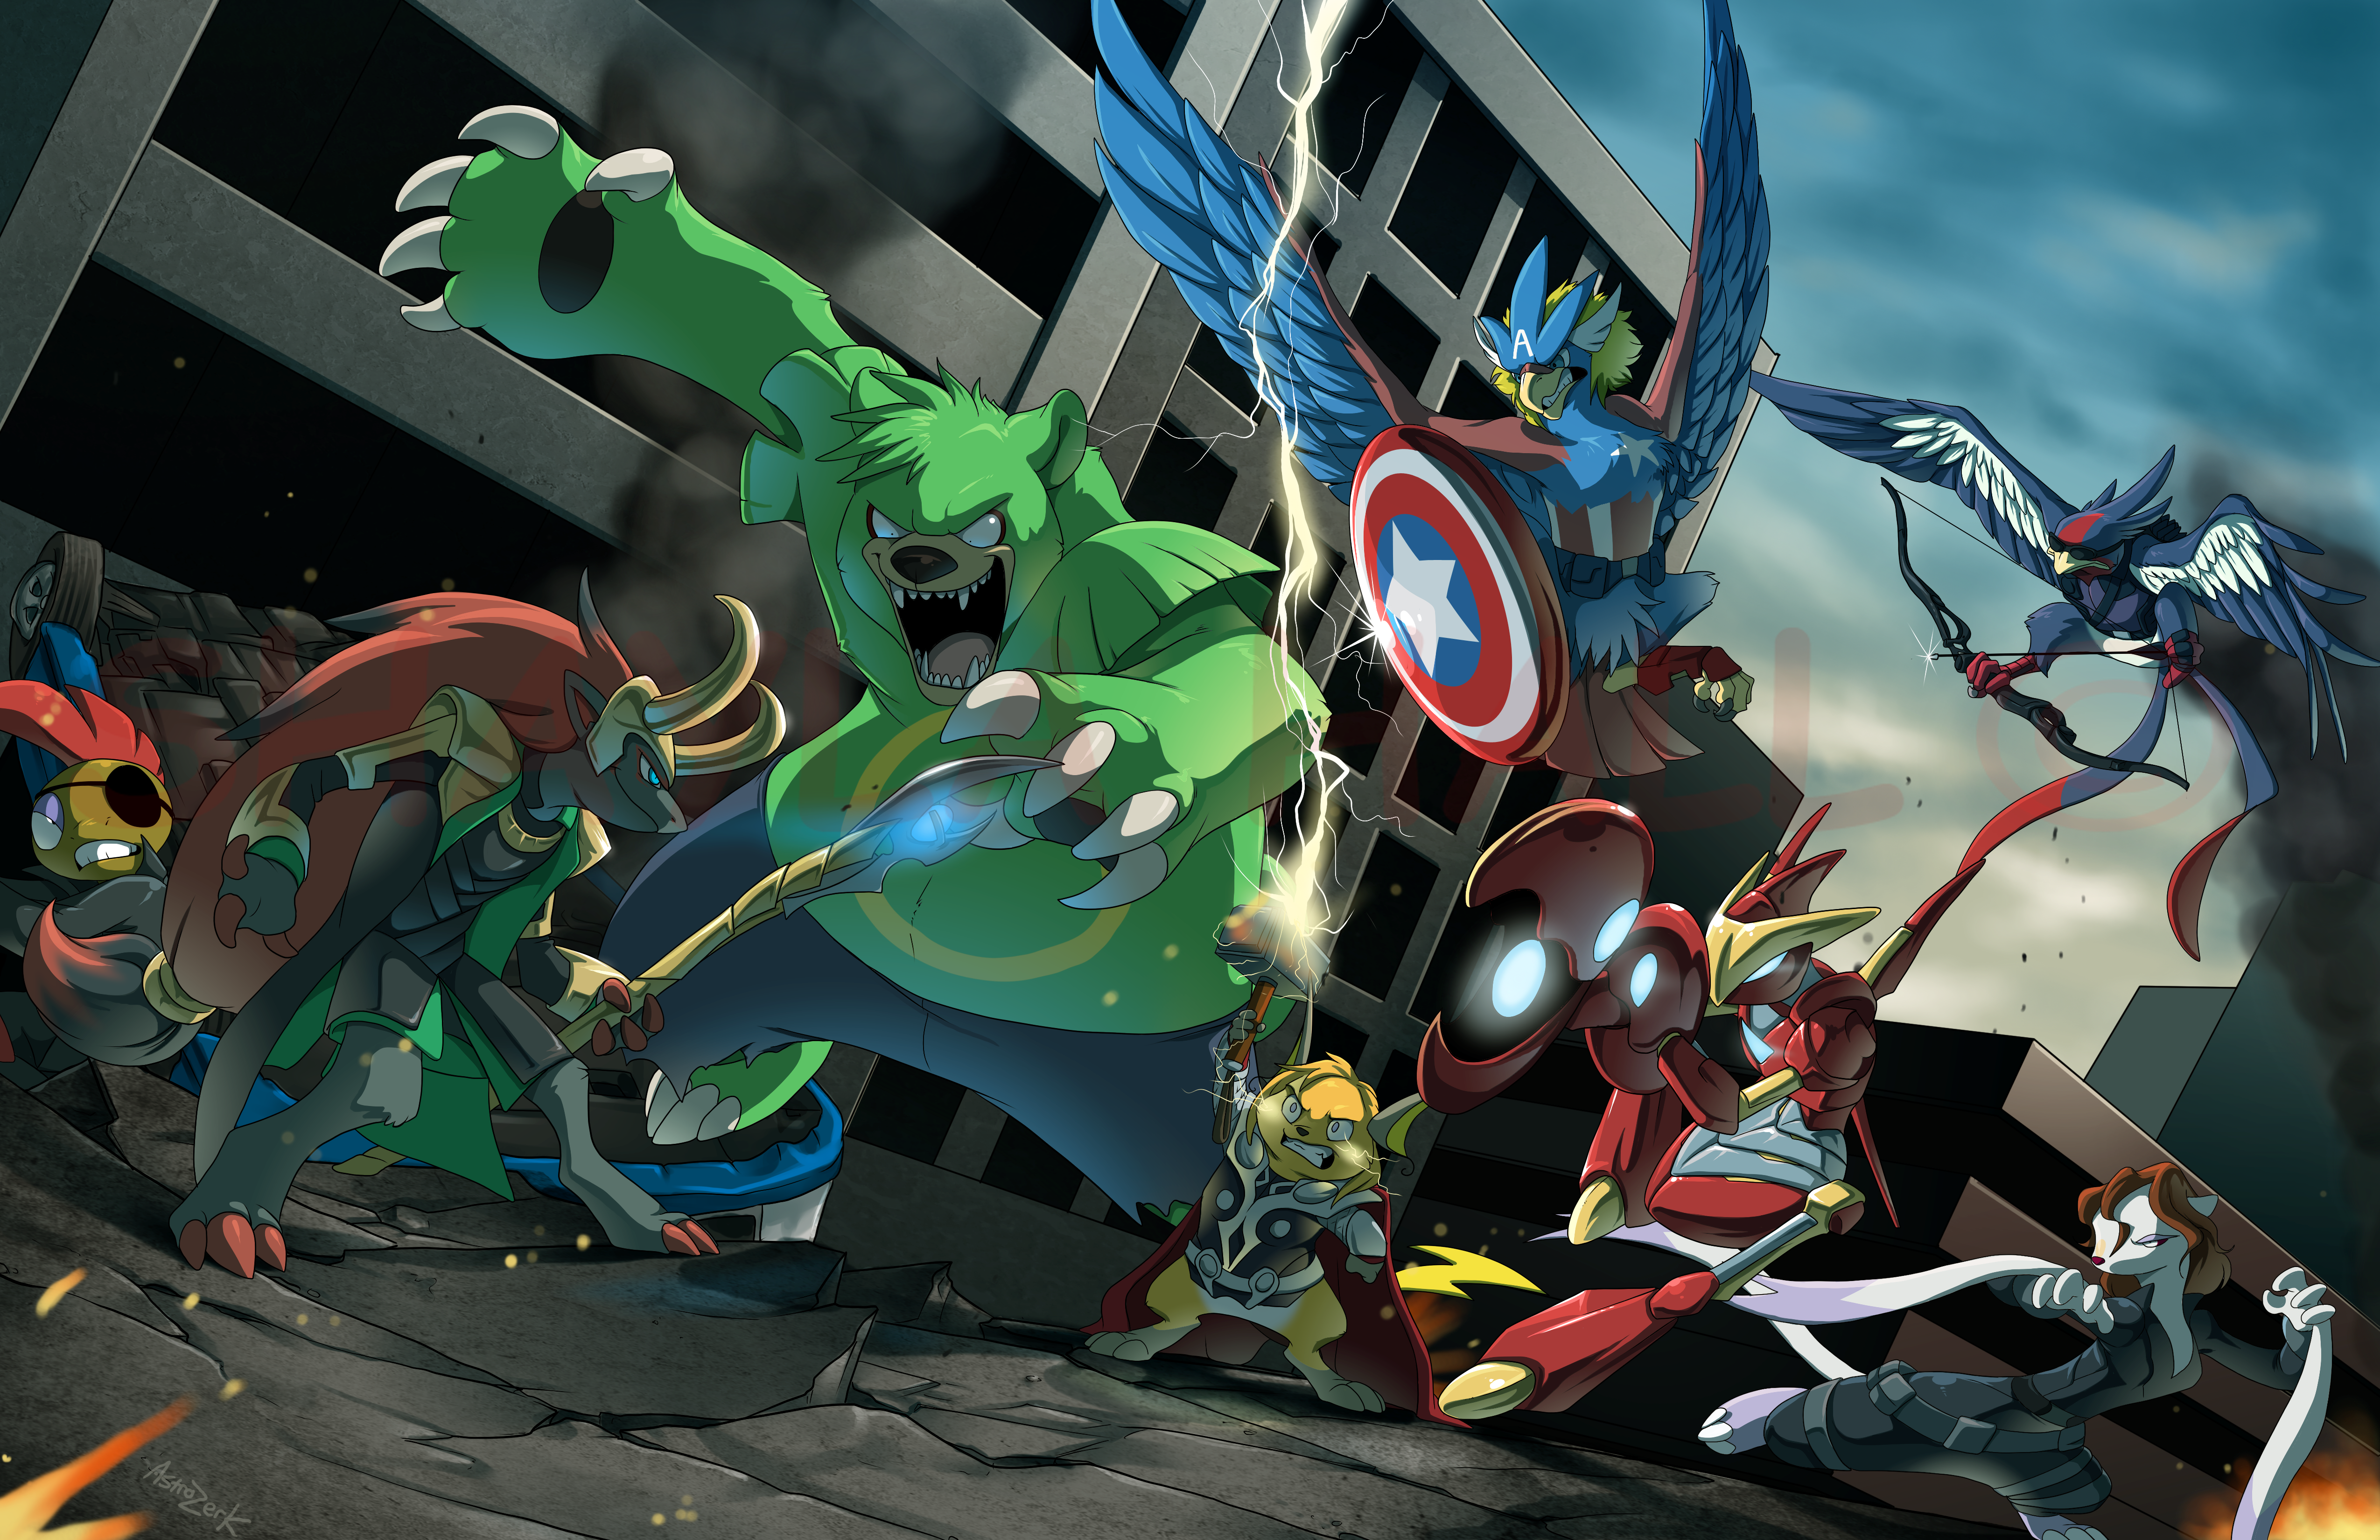 black widow, braviary, captain america, hawkeye, hulk, and others